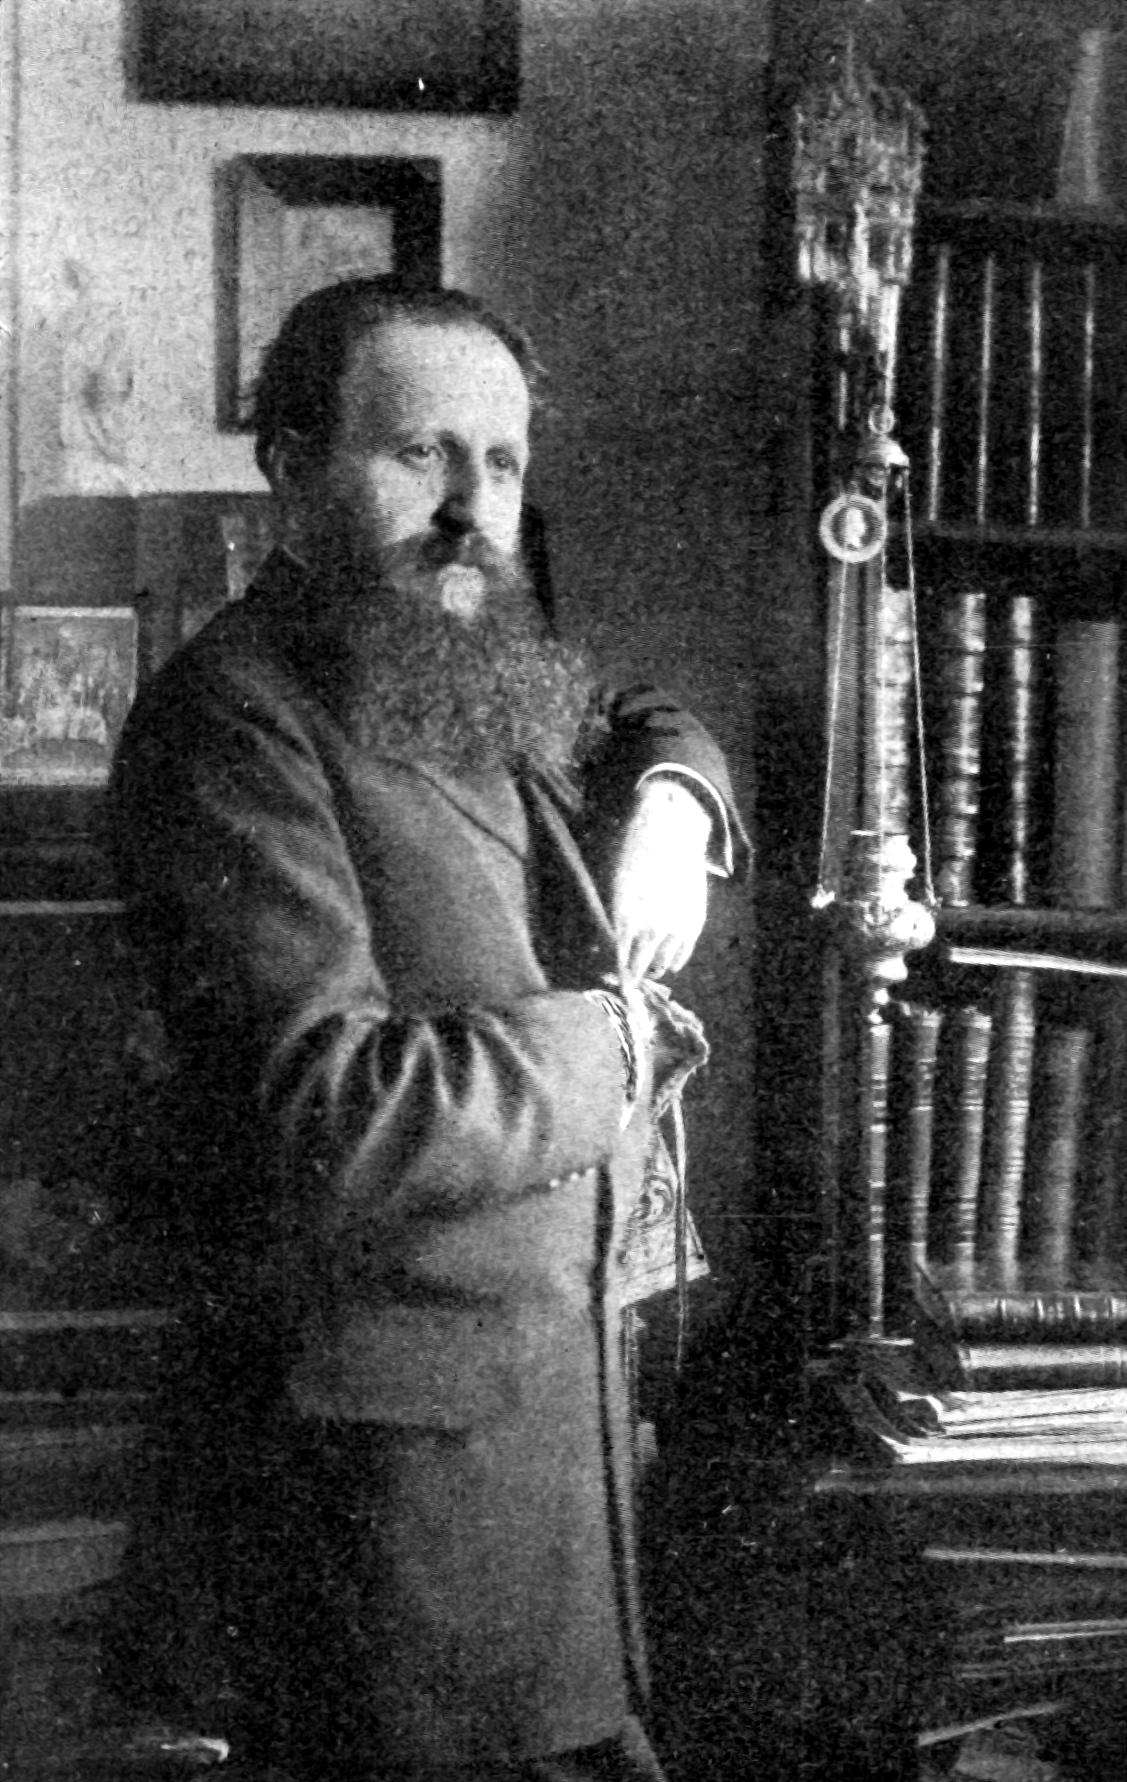 Image of Alexandru Tzigara-Samurca? from Wikidata